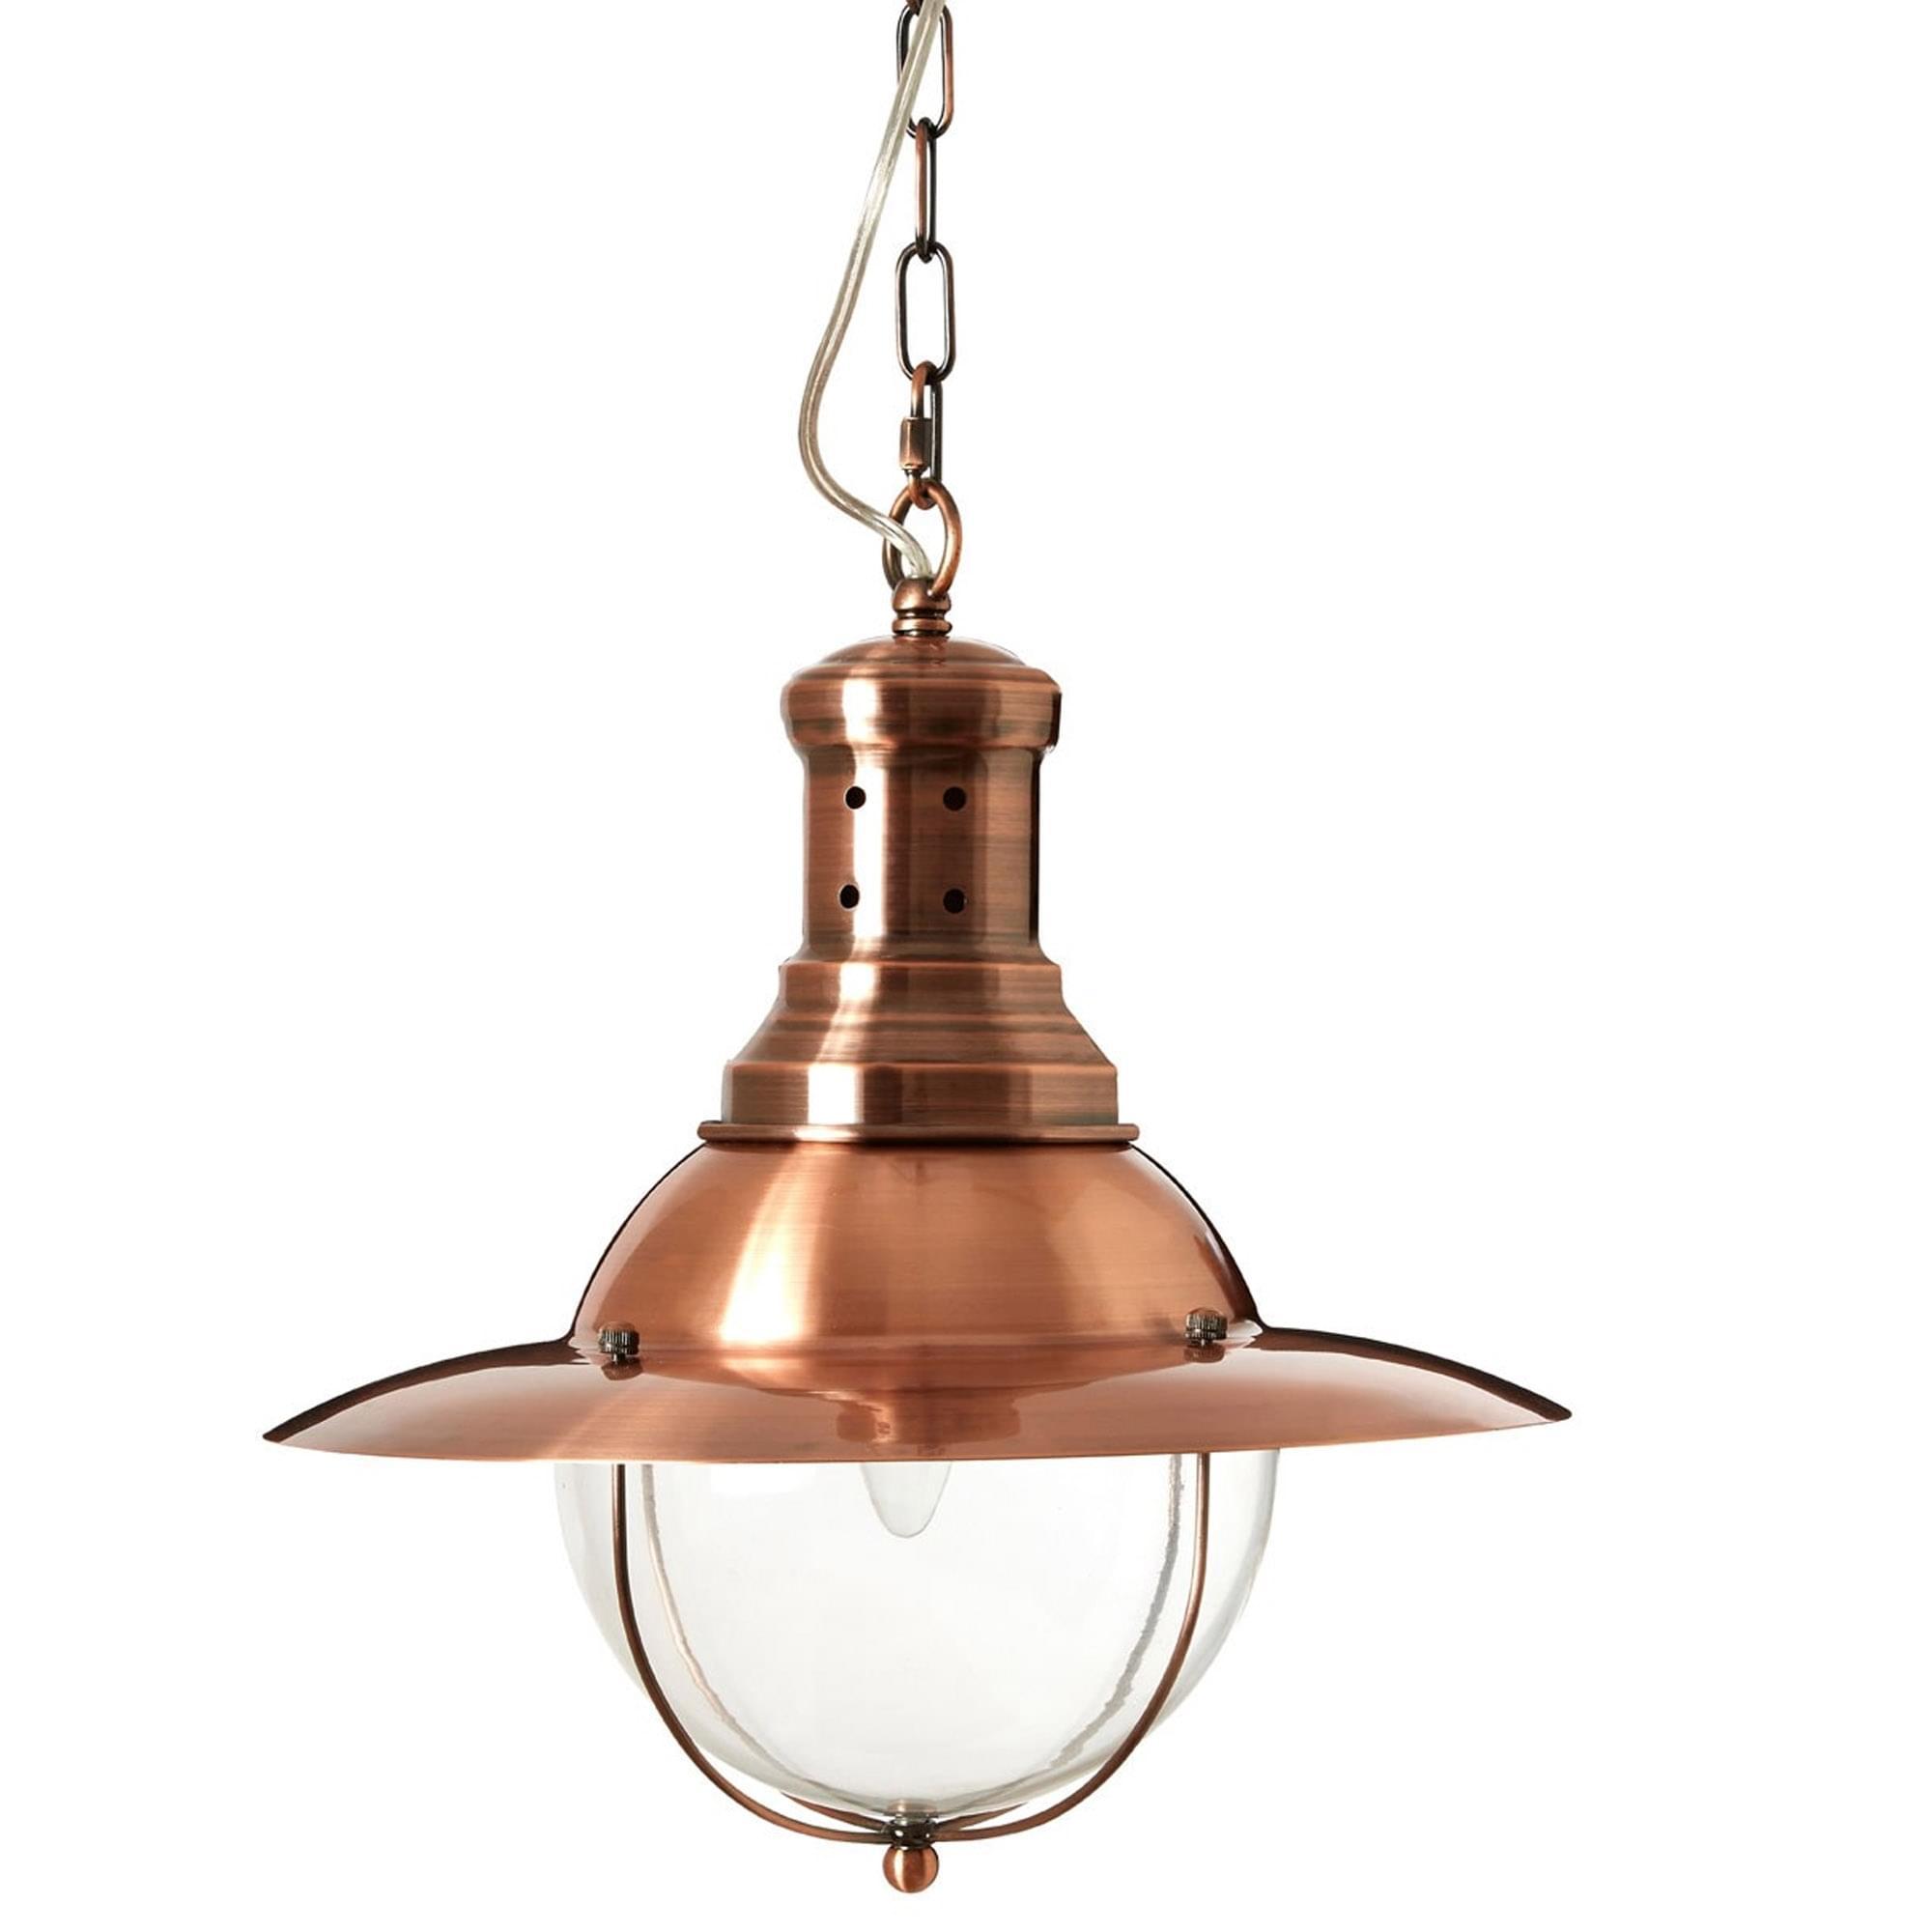 buy online 2474d 057f1 Copper Industrial Revolution Pendant Light